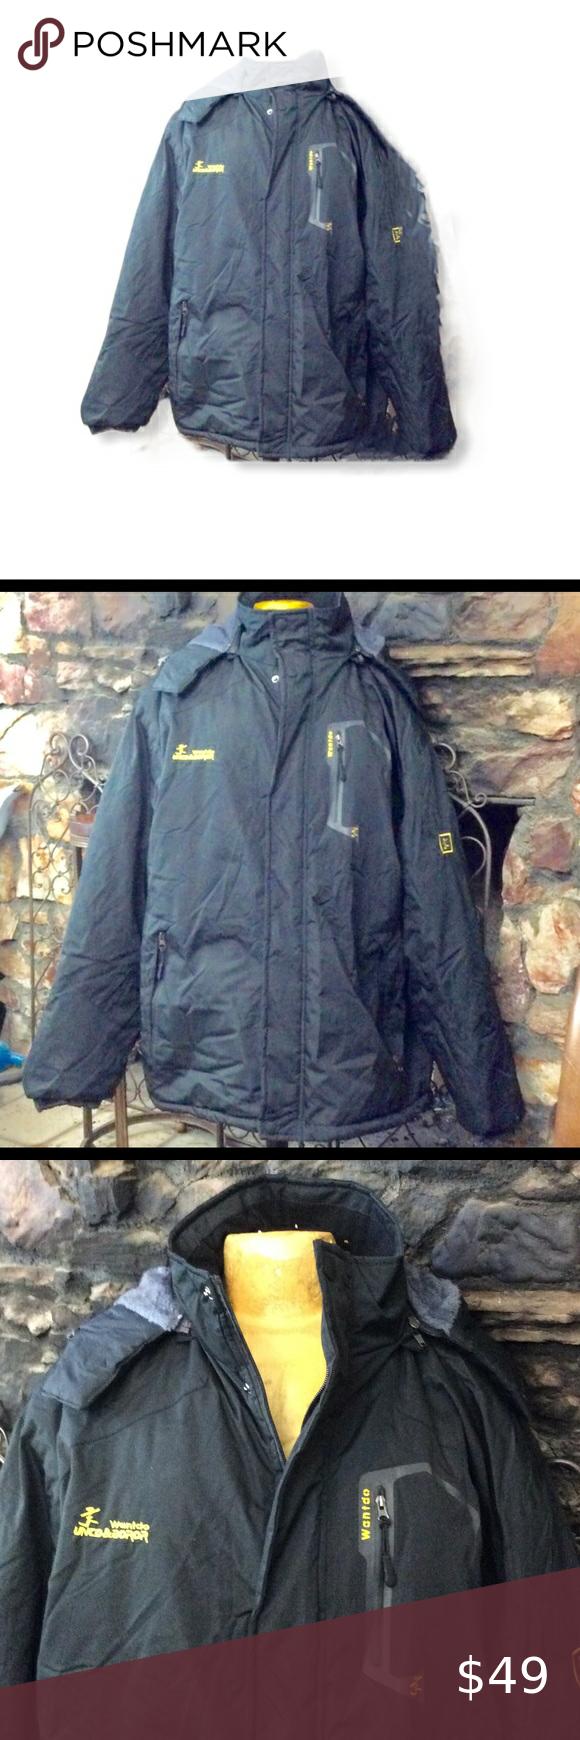 Wantdo Aoror Waterproof Ski Jacket Ski Jacket Jackets Saga Outerwear [ 1740 x 580 Pixel ]